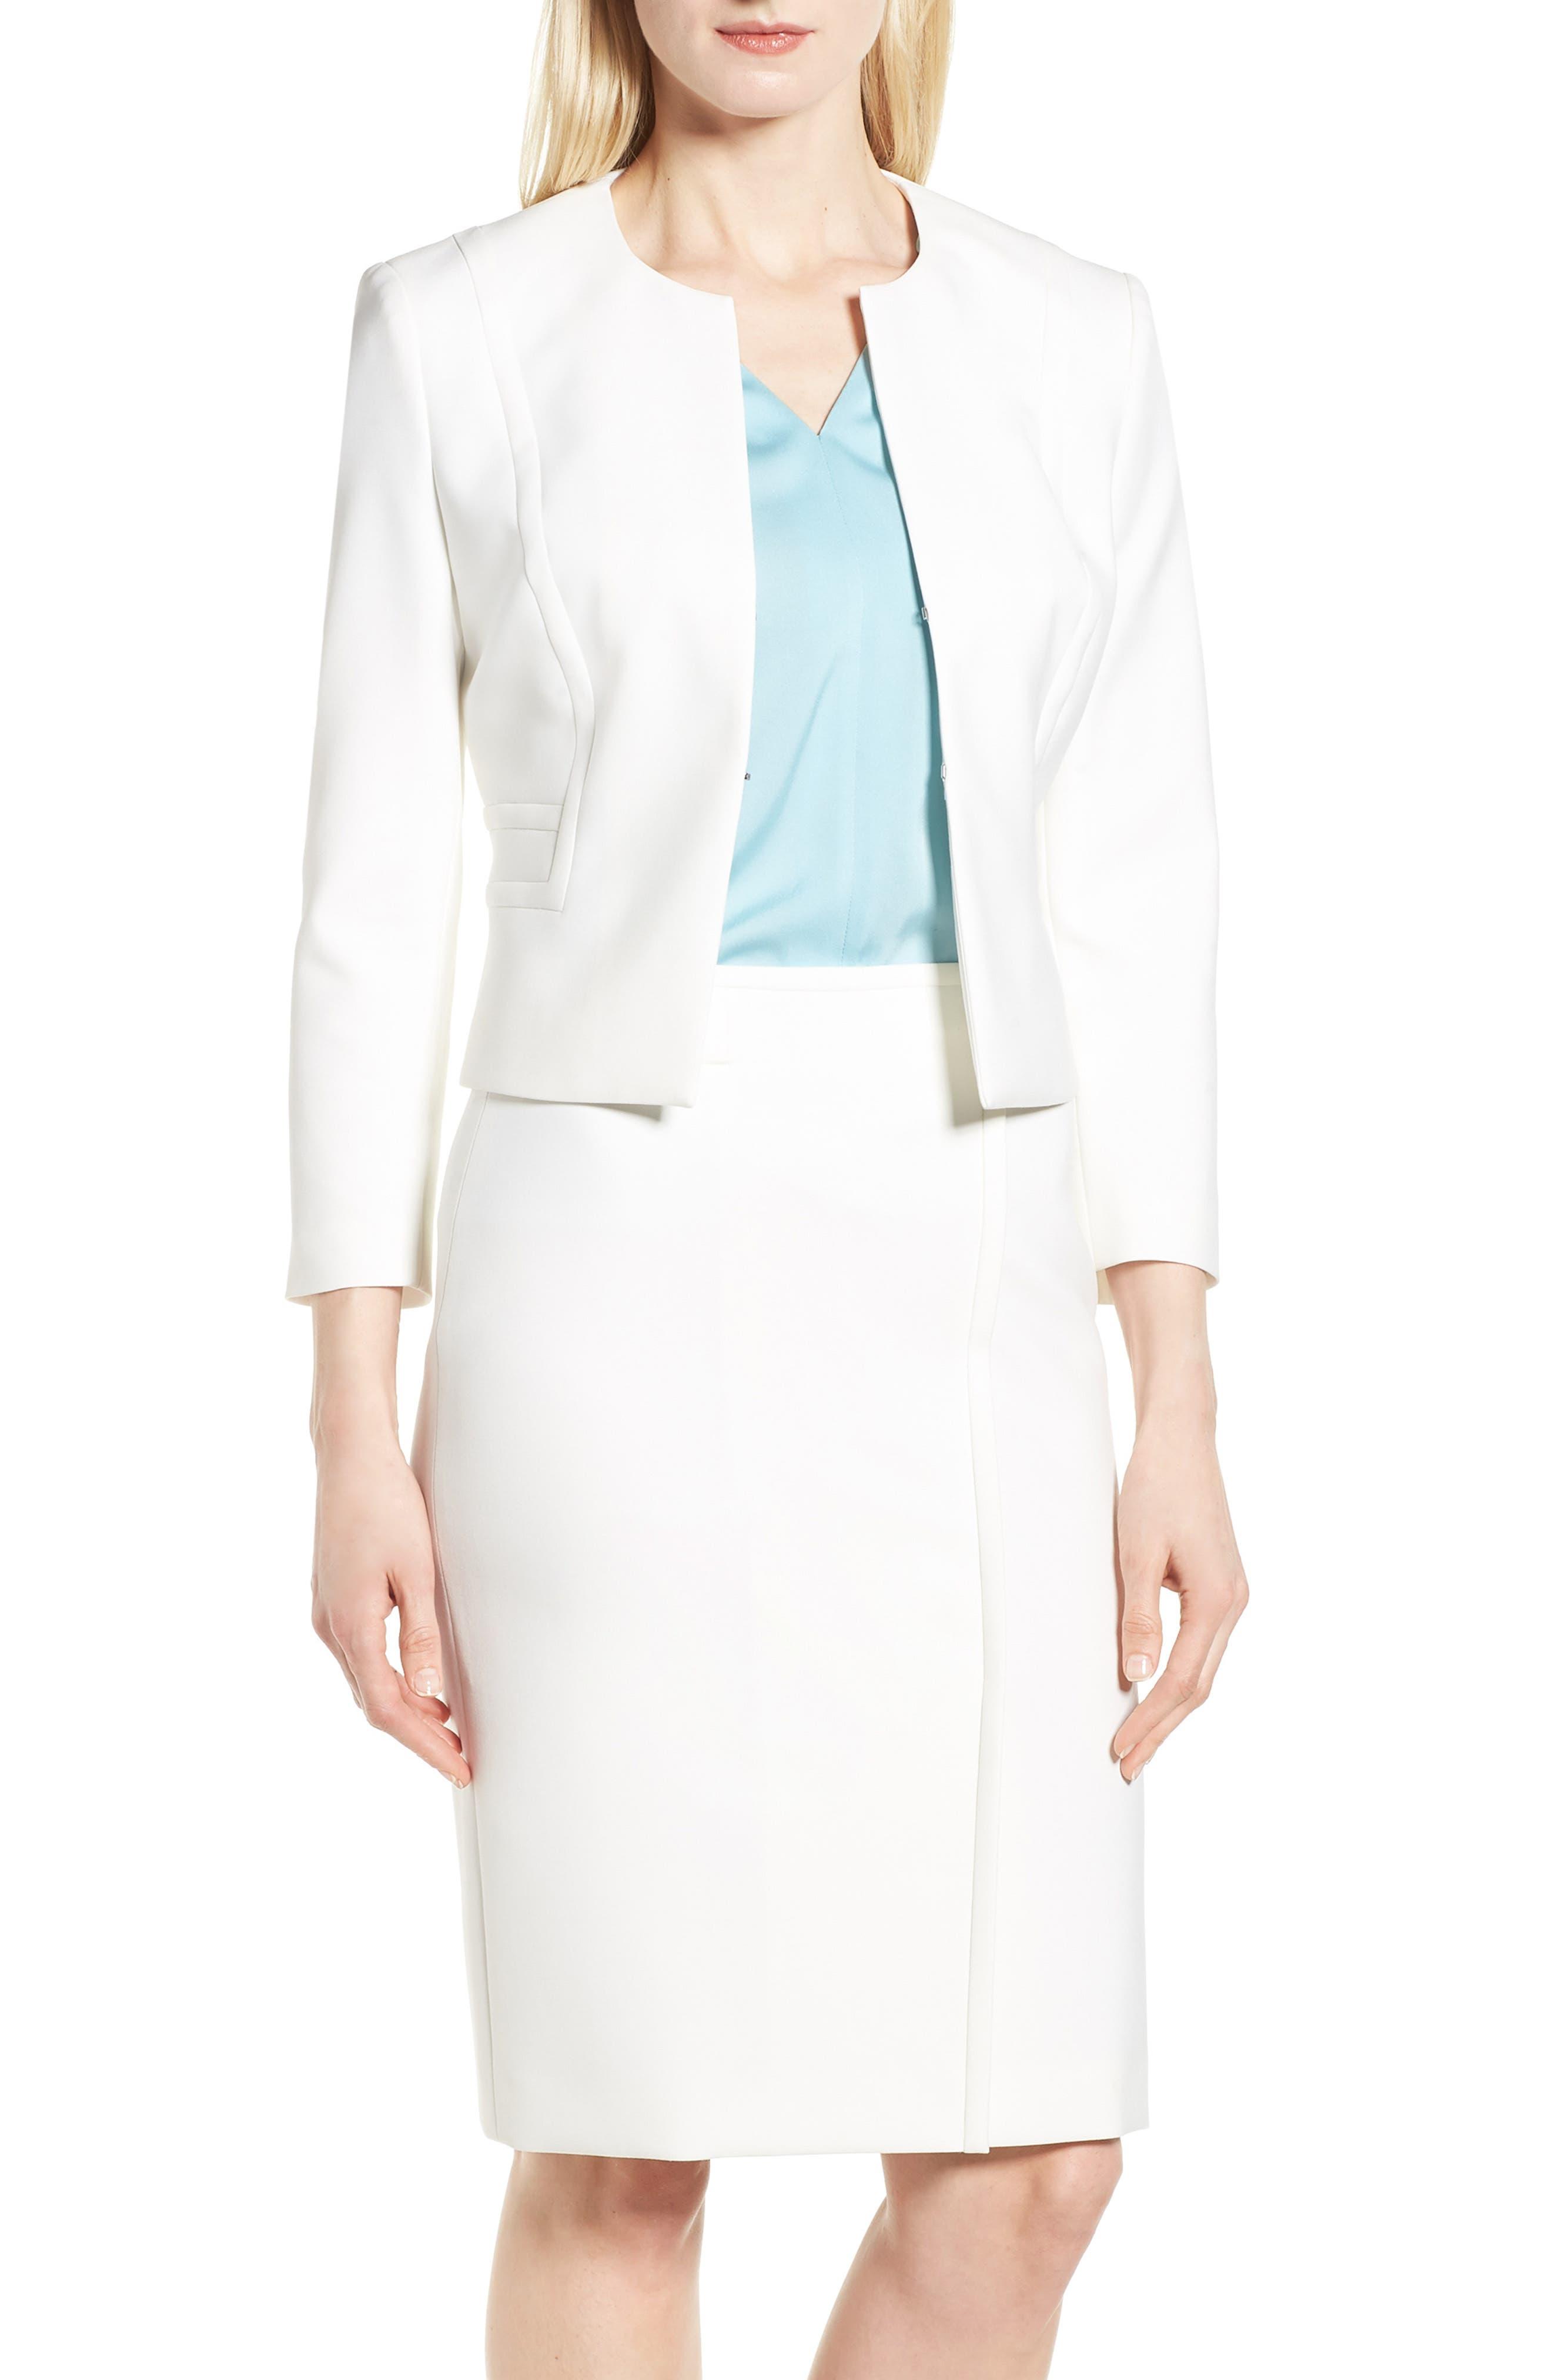 Jadama Suit Jacket,                             Main thumbnail 1, color,                             112